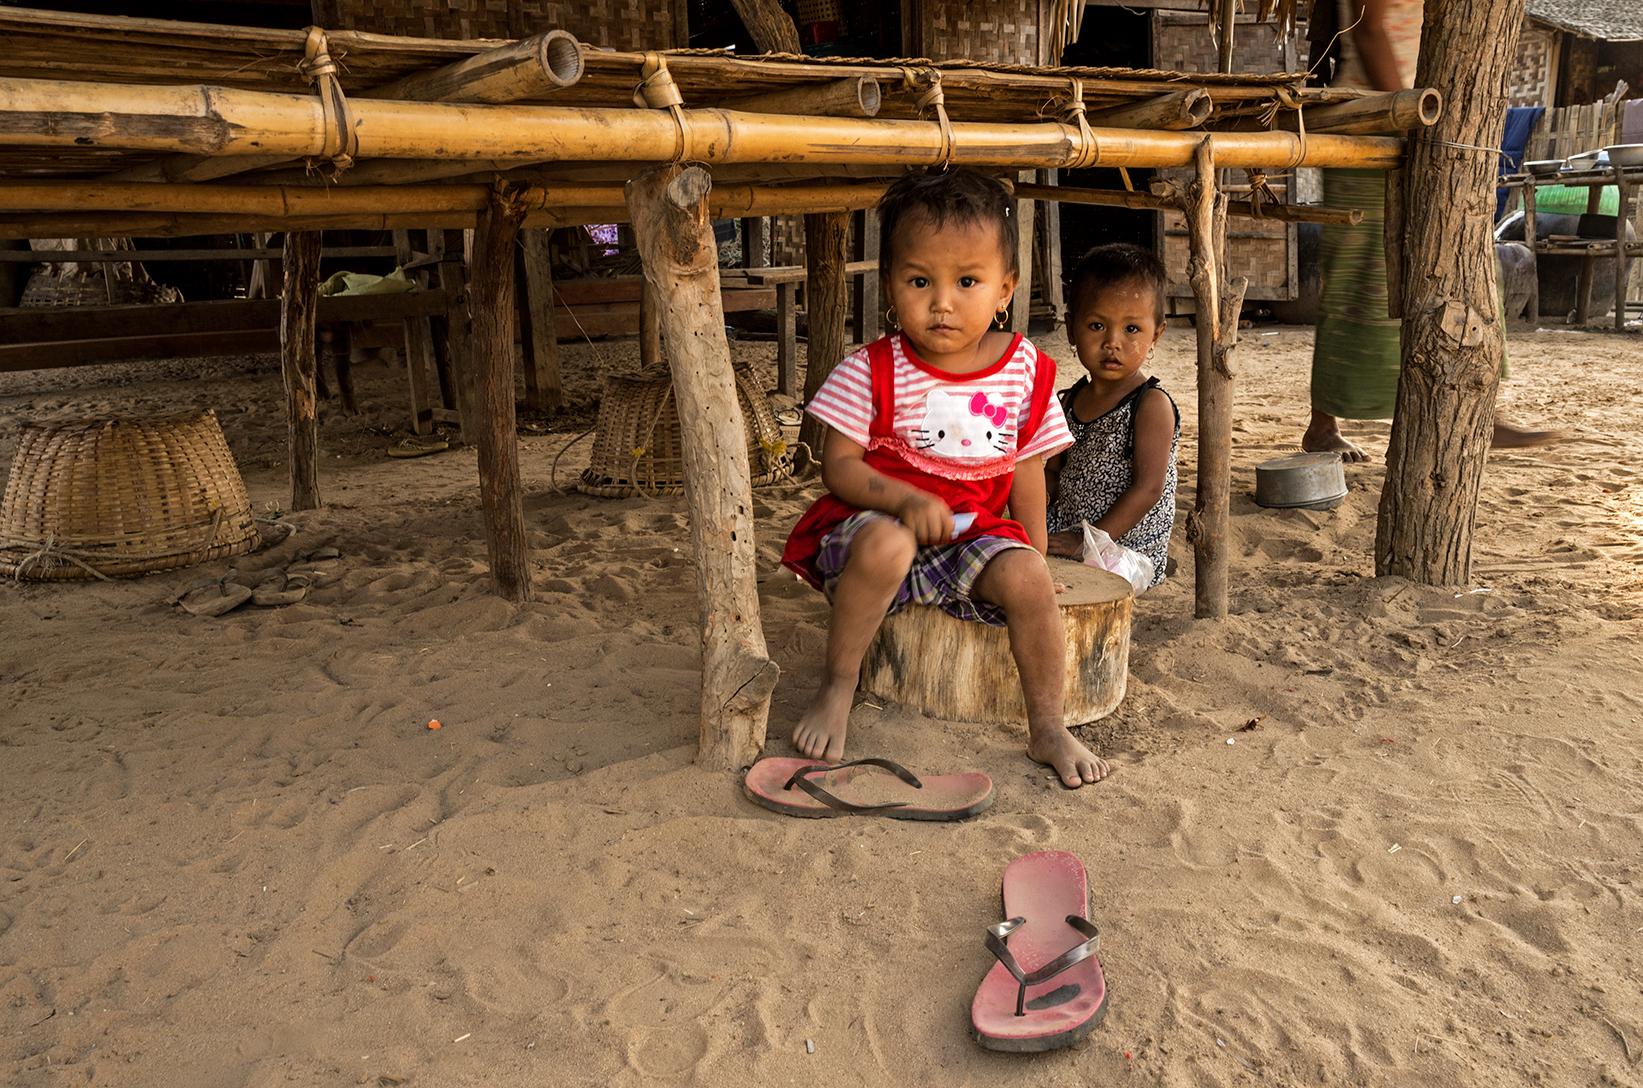 Mandalay-village-life-08_s.jpg